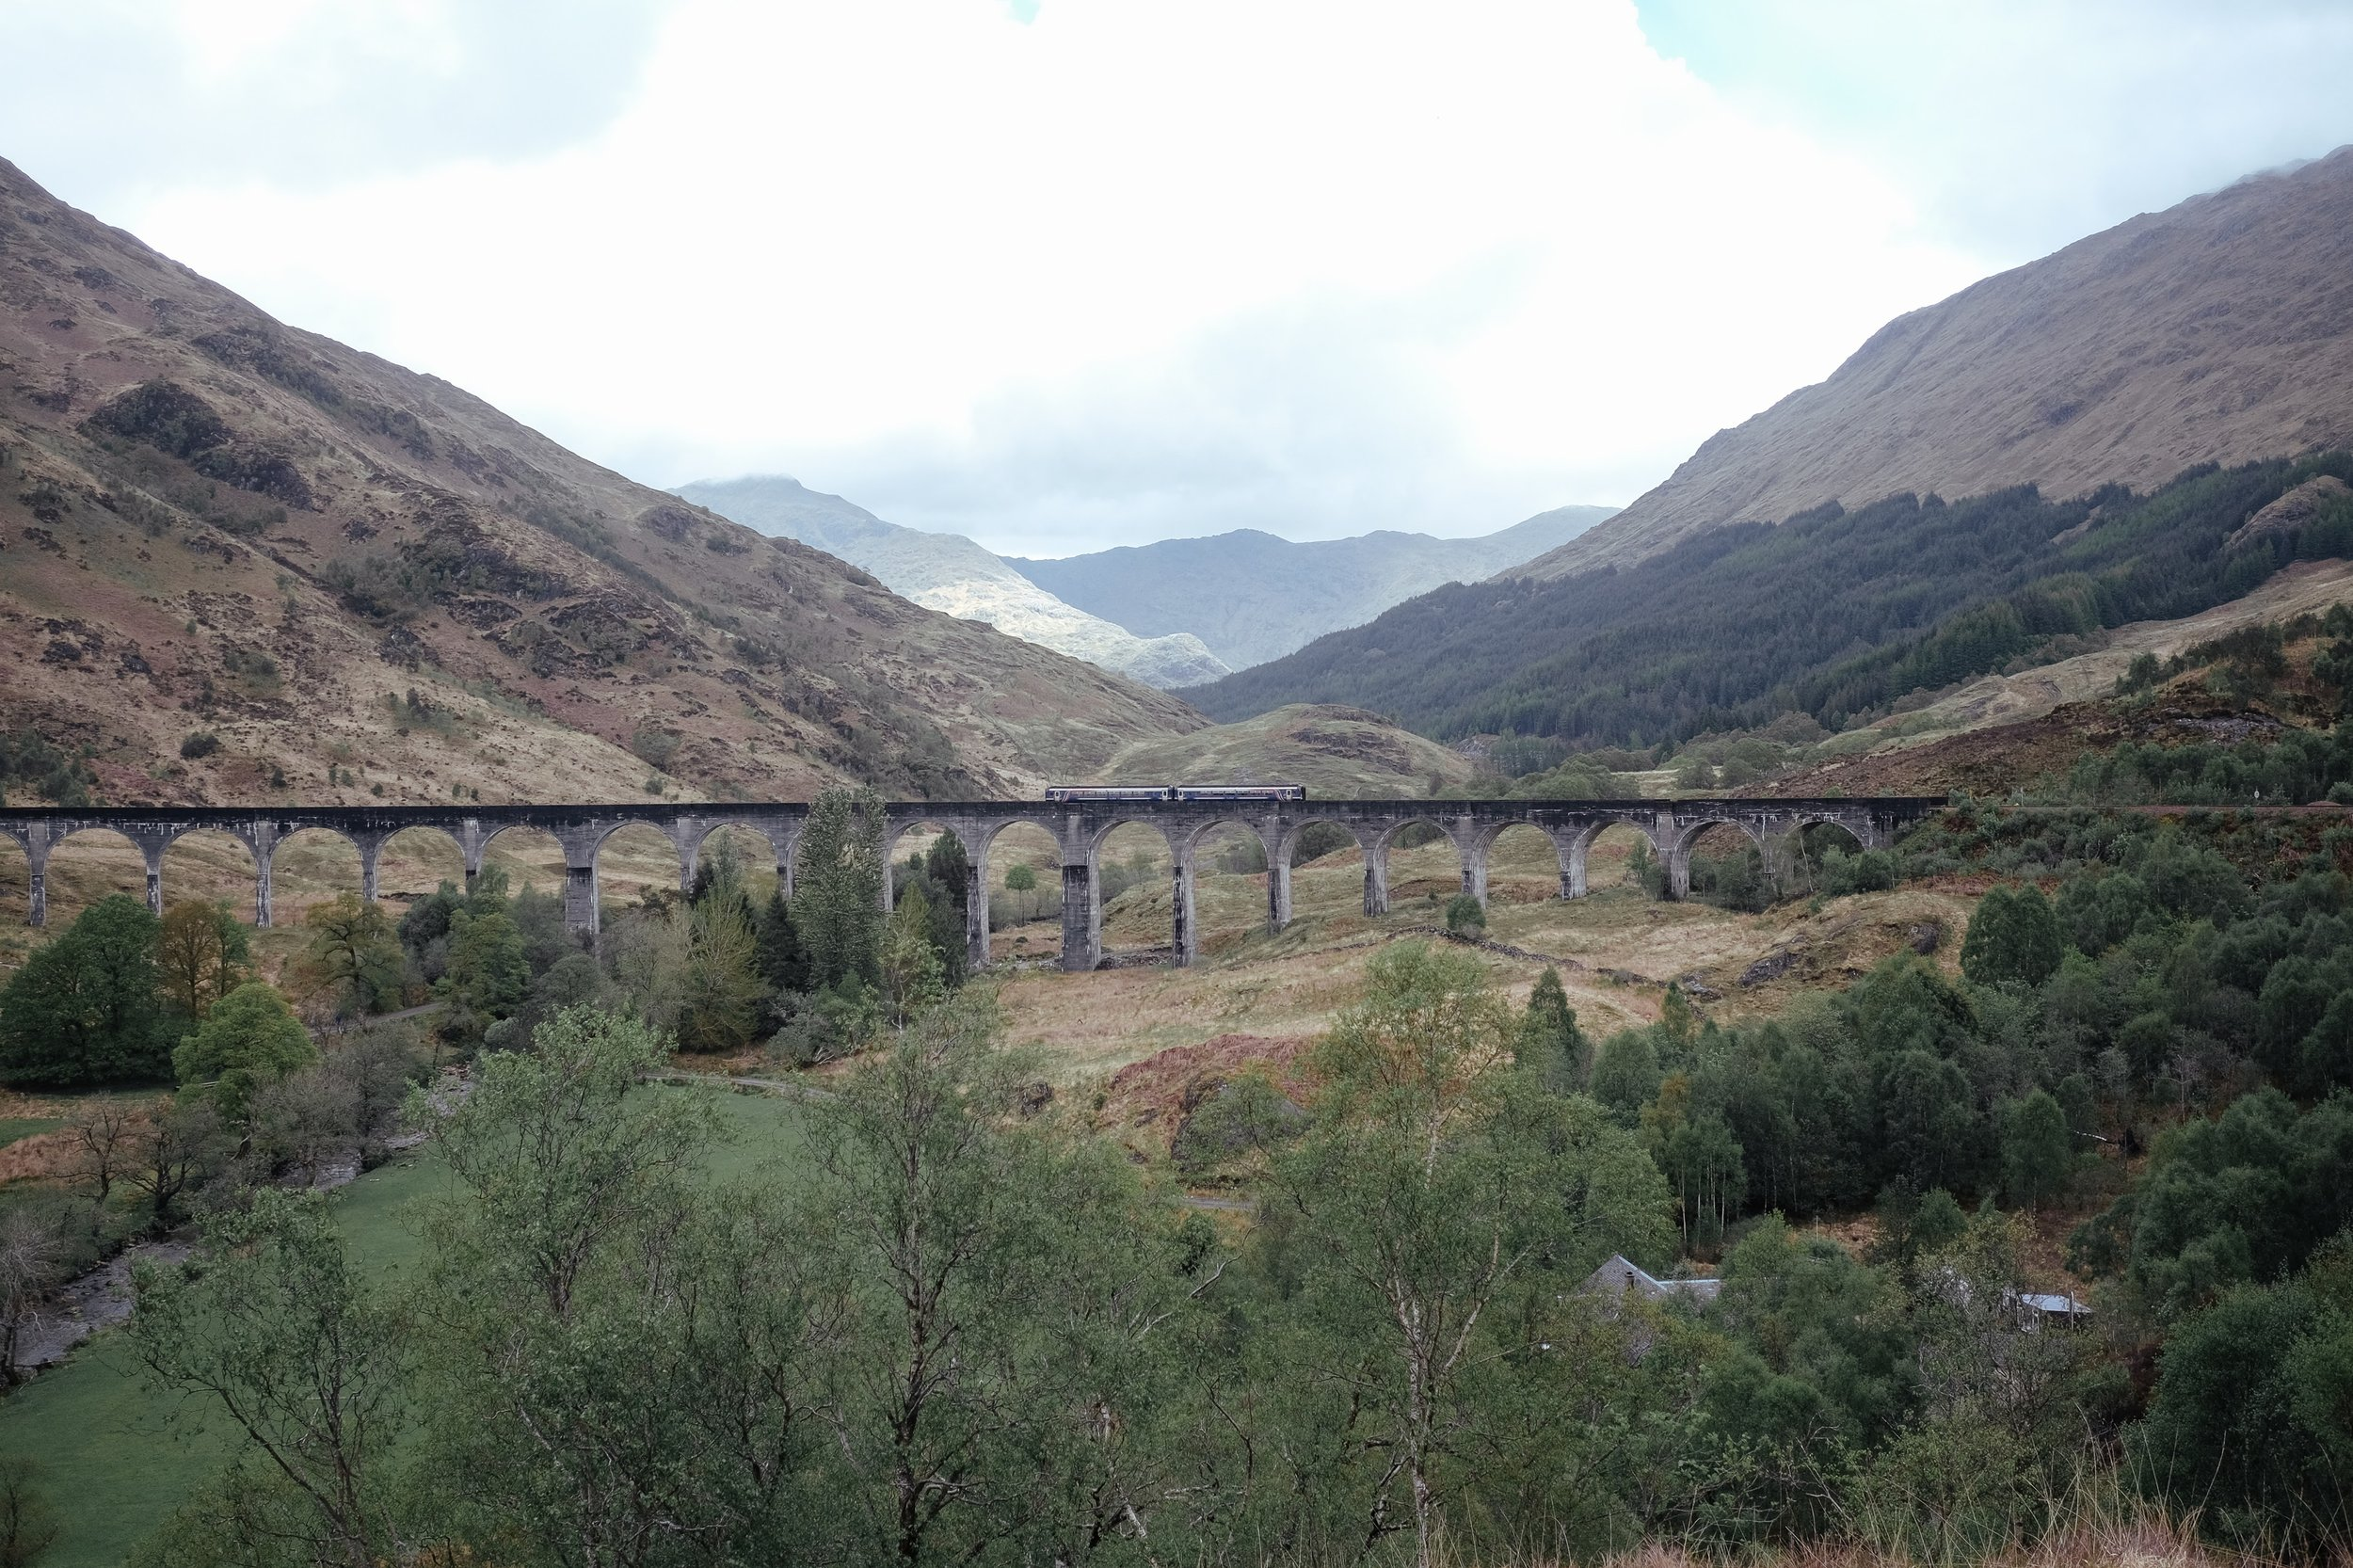 Day 5 Glencoeto Tomintoul - Glenfinnan > Neptune's Staircase> Commando Memorial > Urquhart Castle